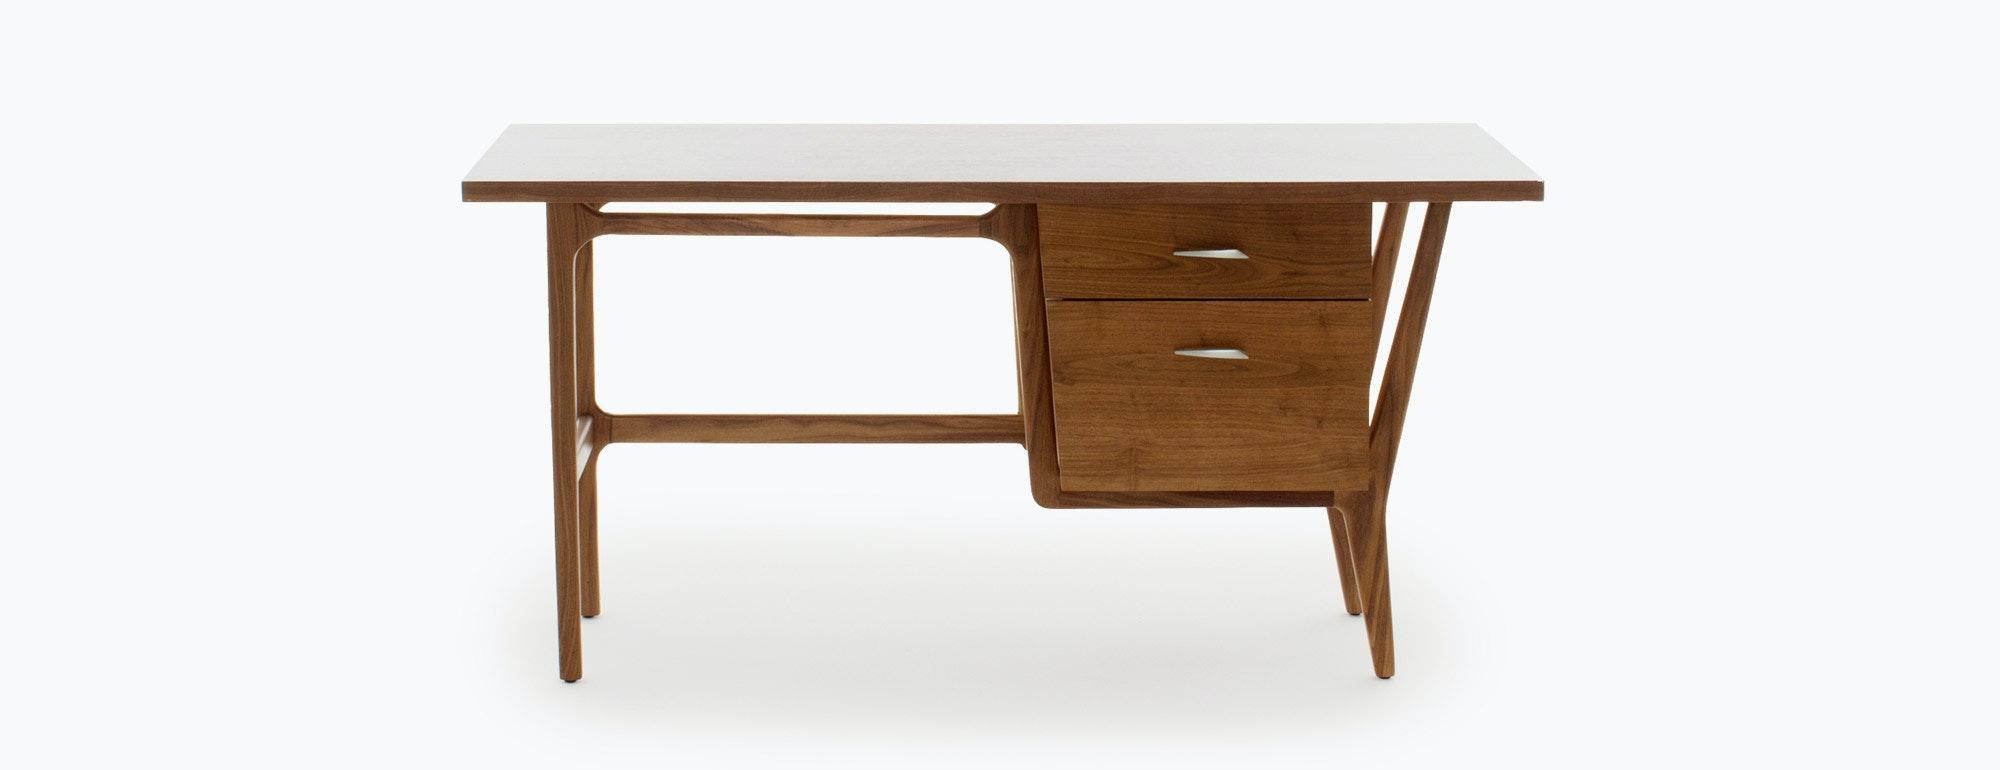 xavier apartment desk joybird